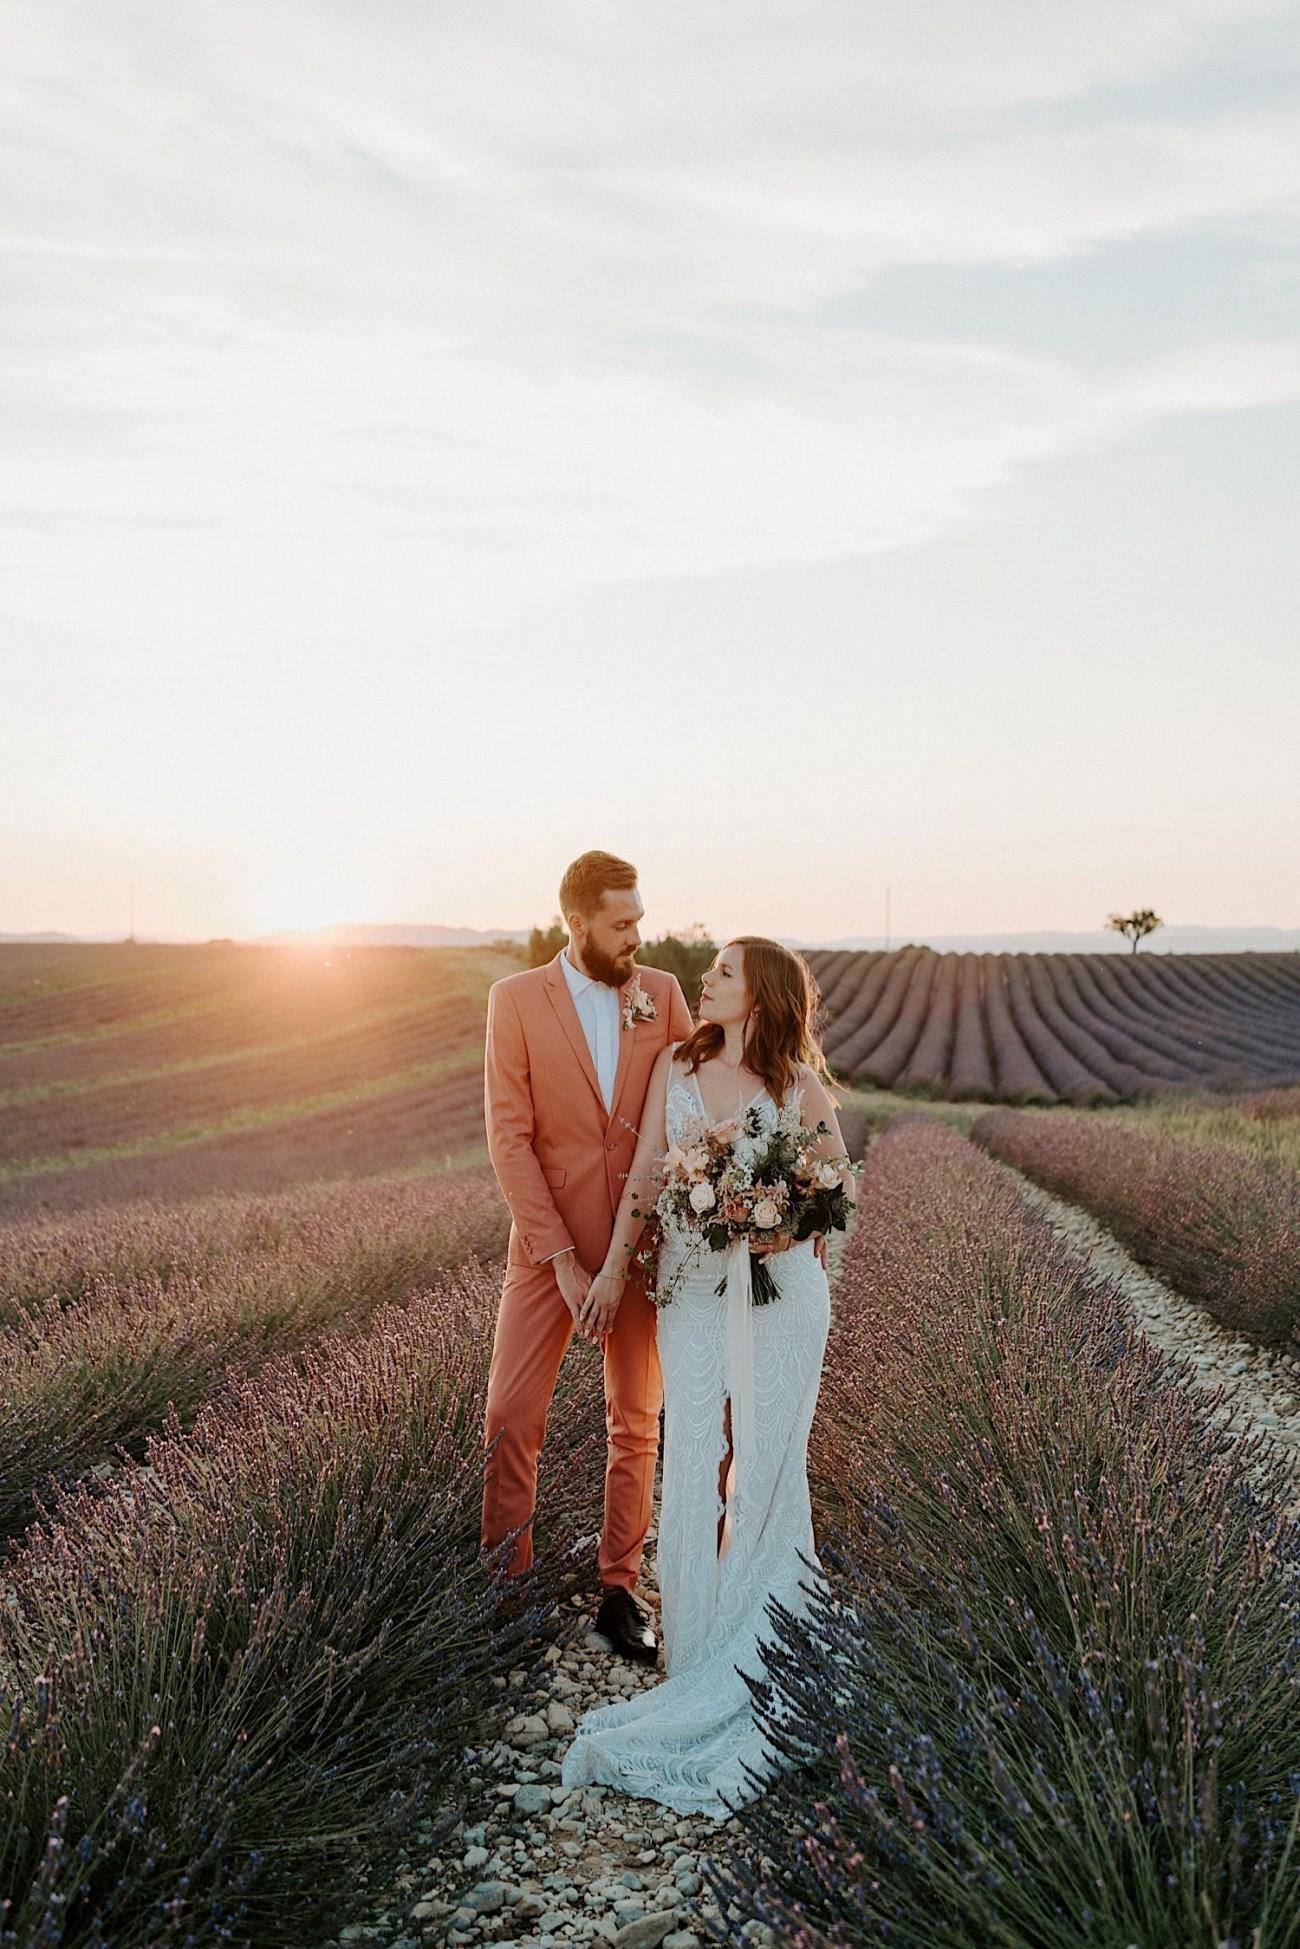 Valensole Wedding Photos Lavender Field Wedding Provence Wedding French Wedding Photographer Destination Wedding France Anais Possamai Photography 01